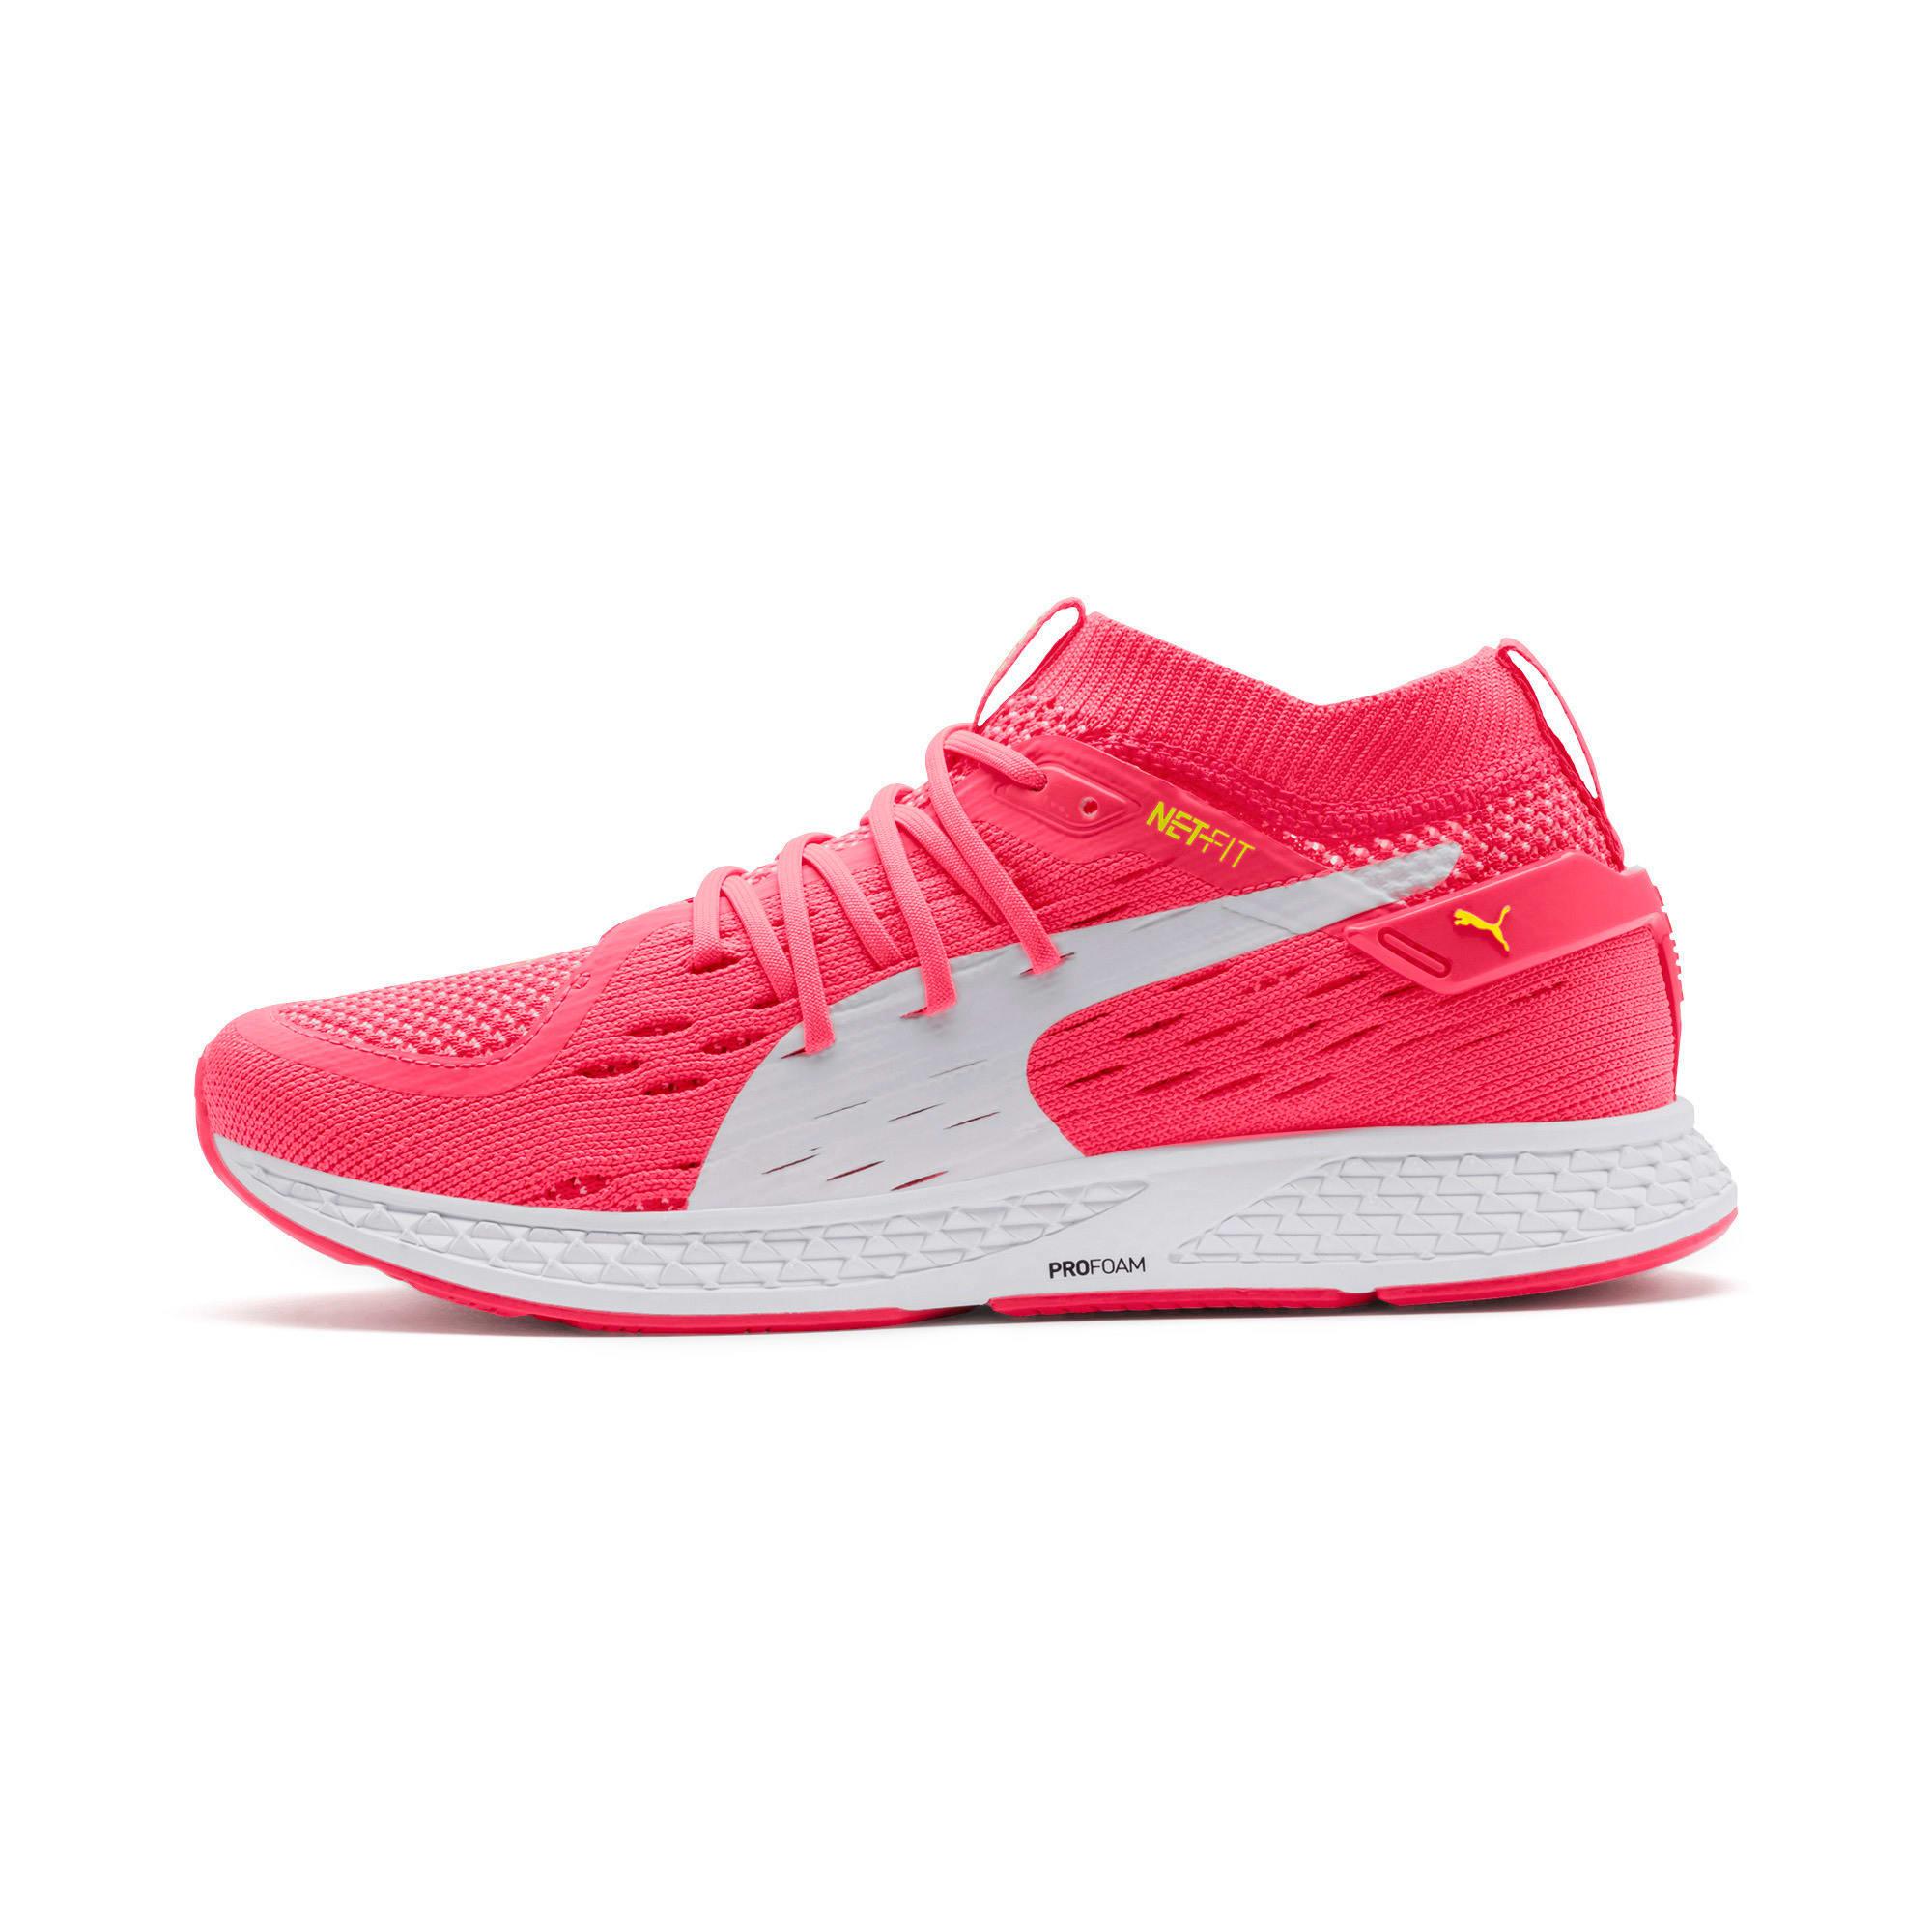 Miniatura 1 de Zapatos para correrSPEED500 para mujer, Pink Alert-White-Yellow, mediano